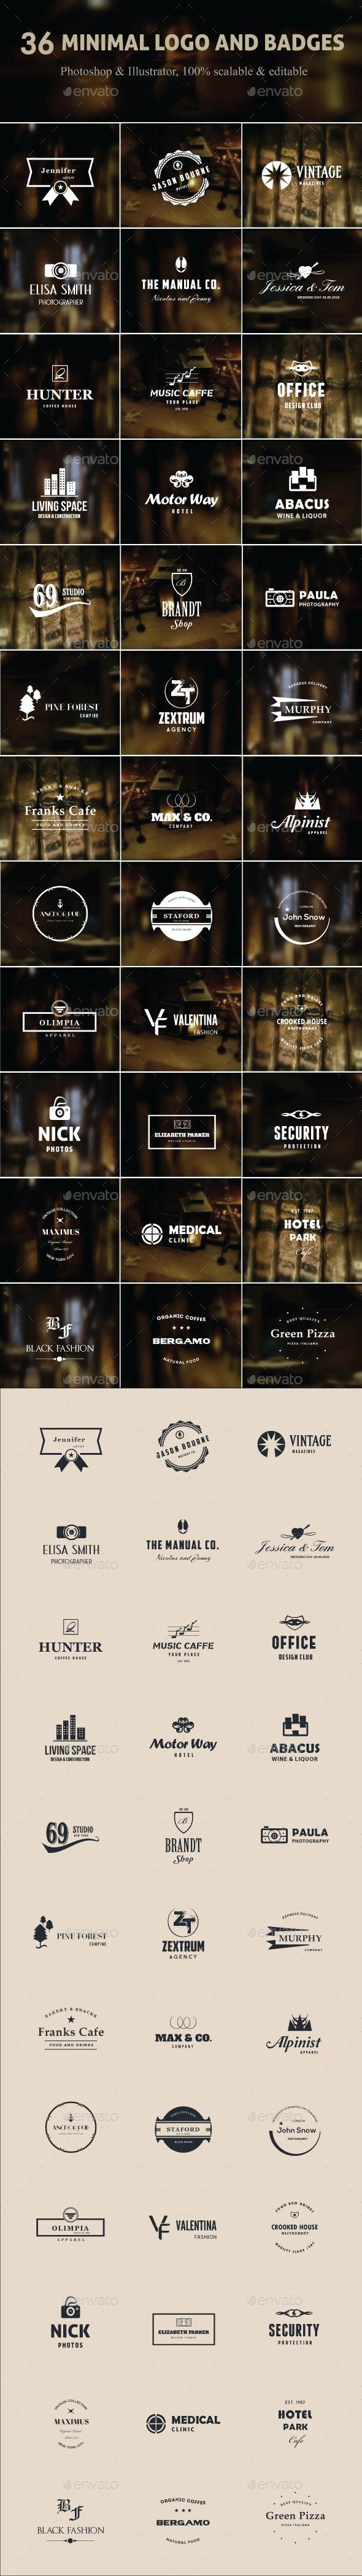 36 Minimal Logo and Badges - Badges & Stickers Web Elements